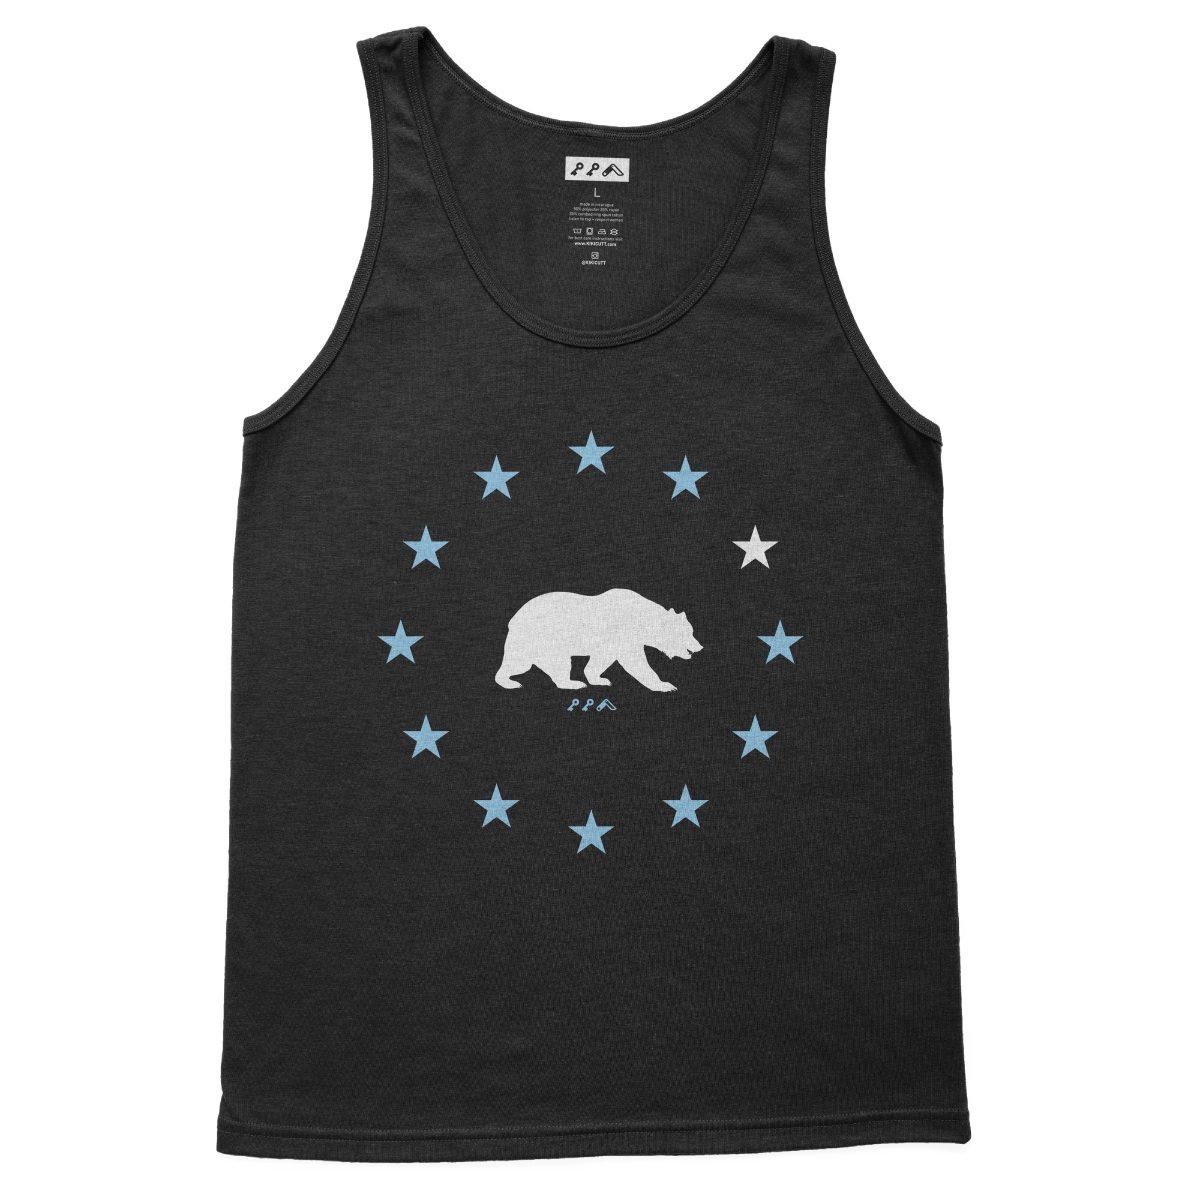 STAR GAZING california bear beach tank tops in charcoal black at kikicutt.com